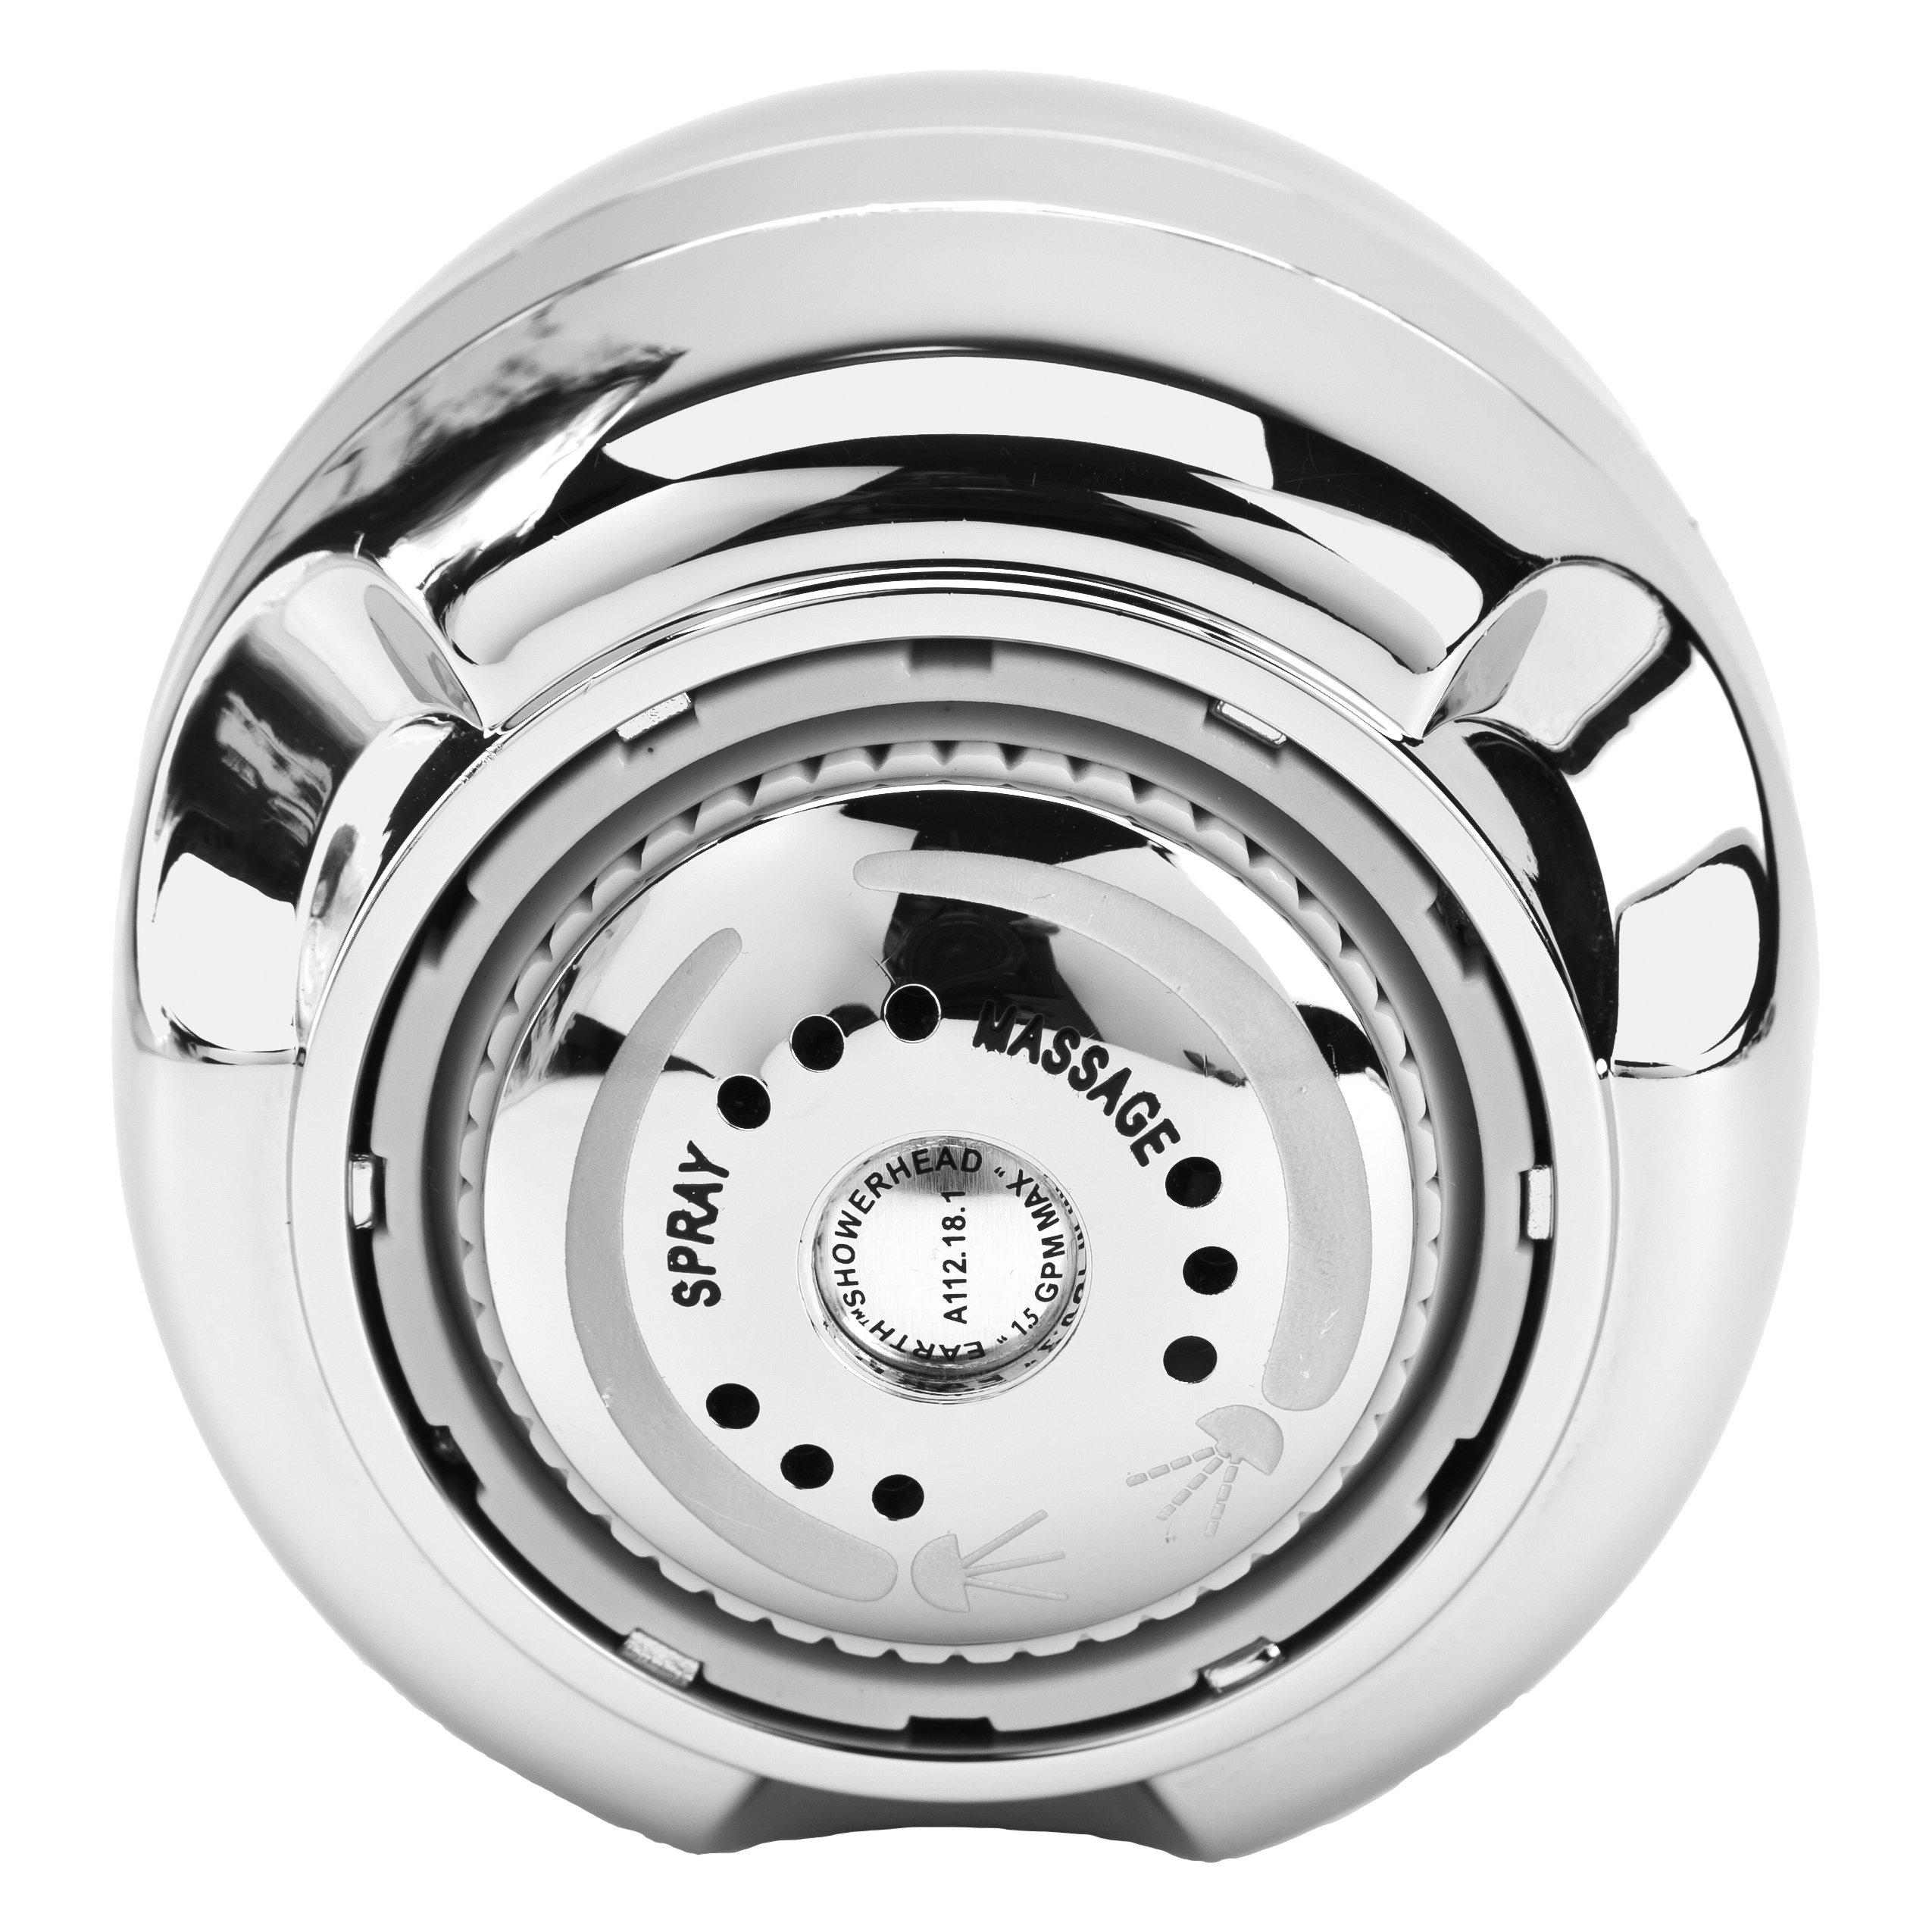 PF WaterWorks SmartFLOW Water Sense Listed Water Saving Efficient Three Spray Pattern Massaging Showerhead - 1.5 GPM; PF0555 by PF WaterWorks (Image #2)